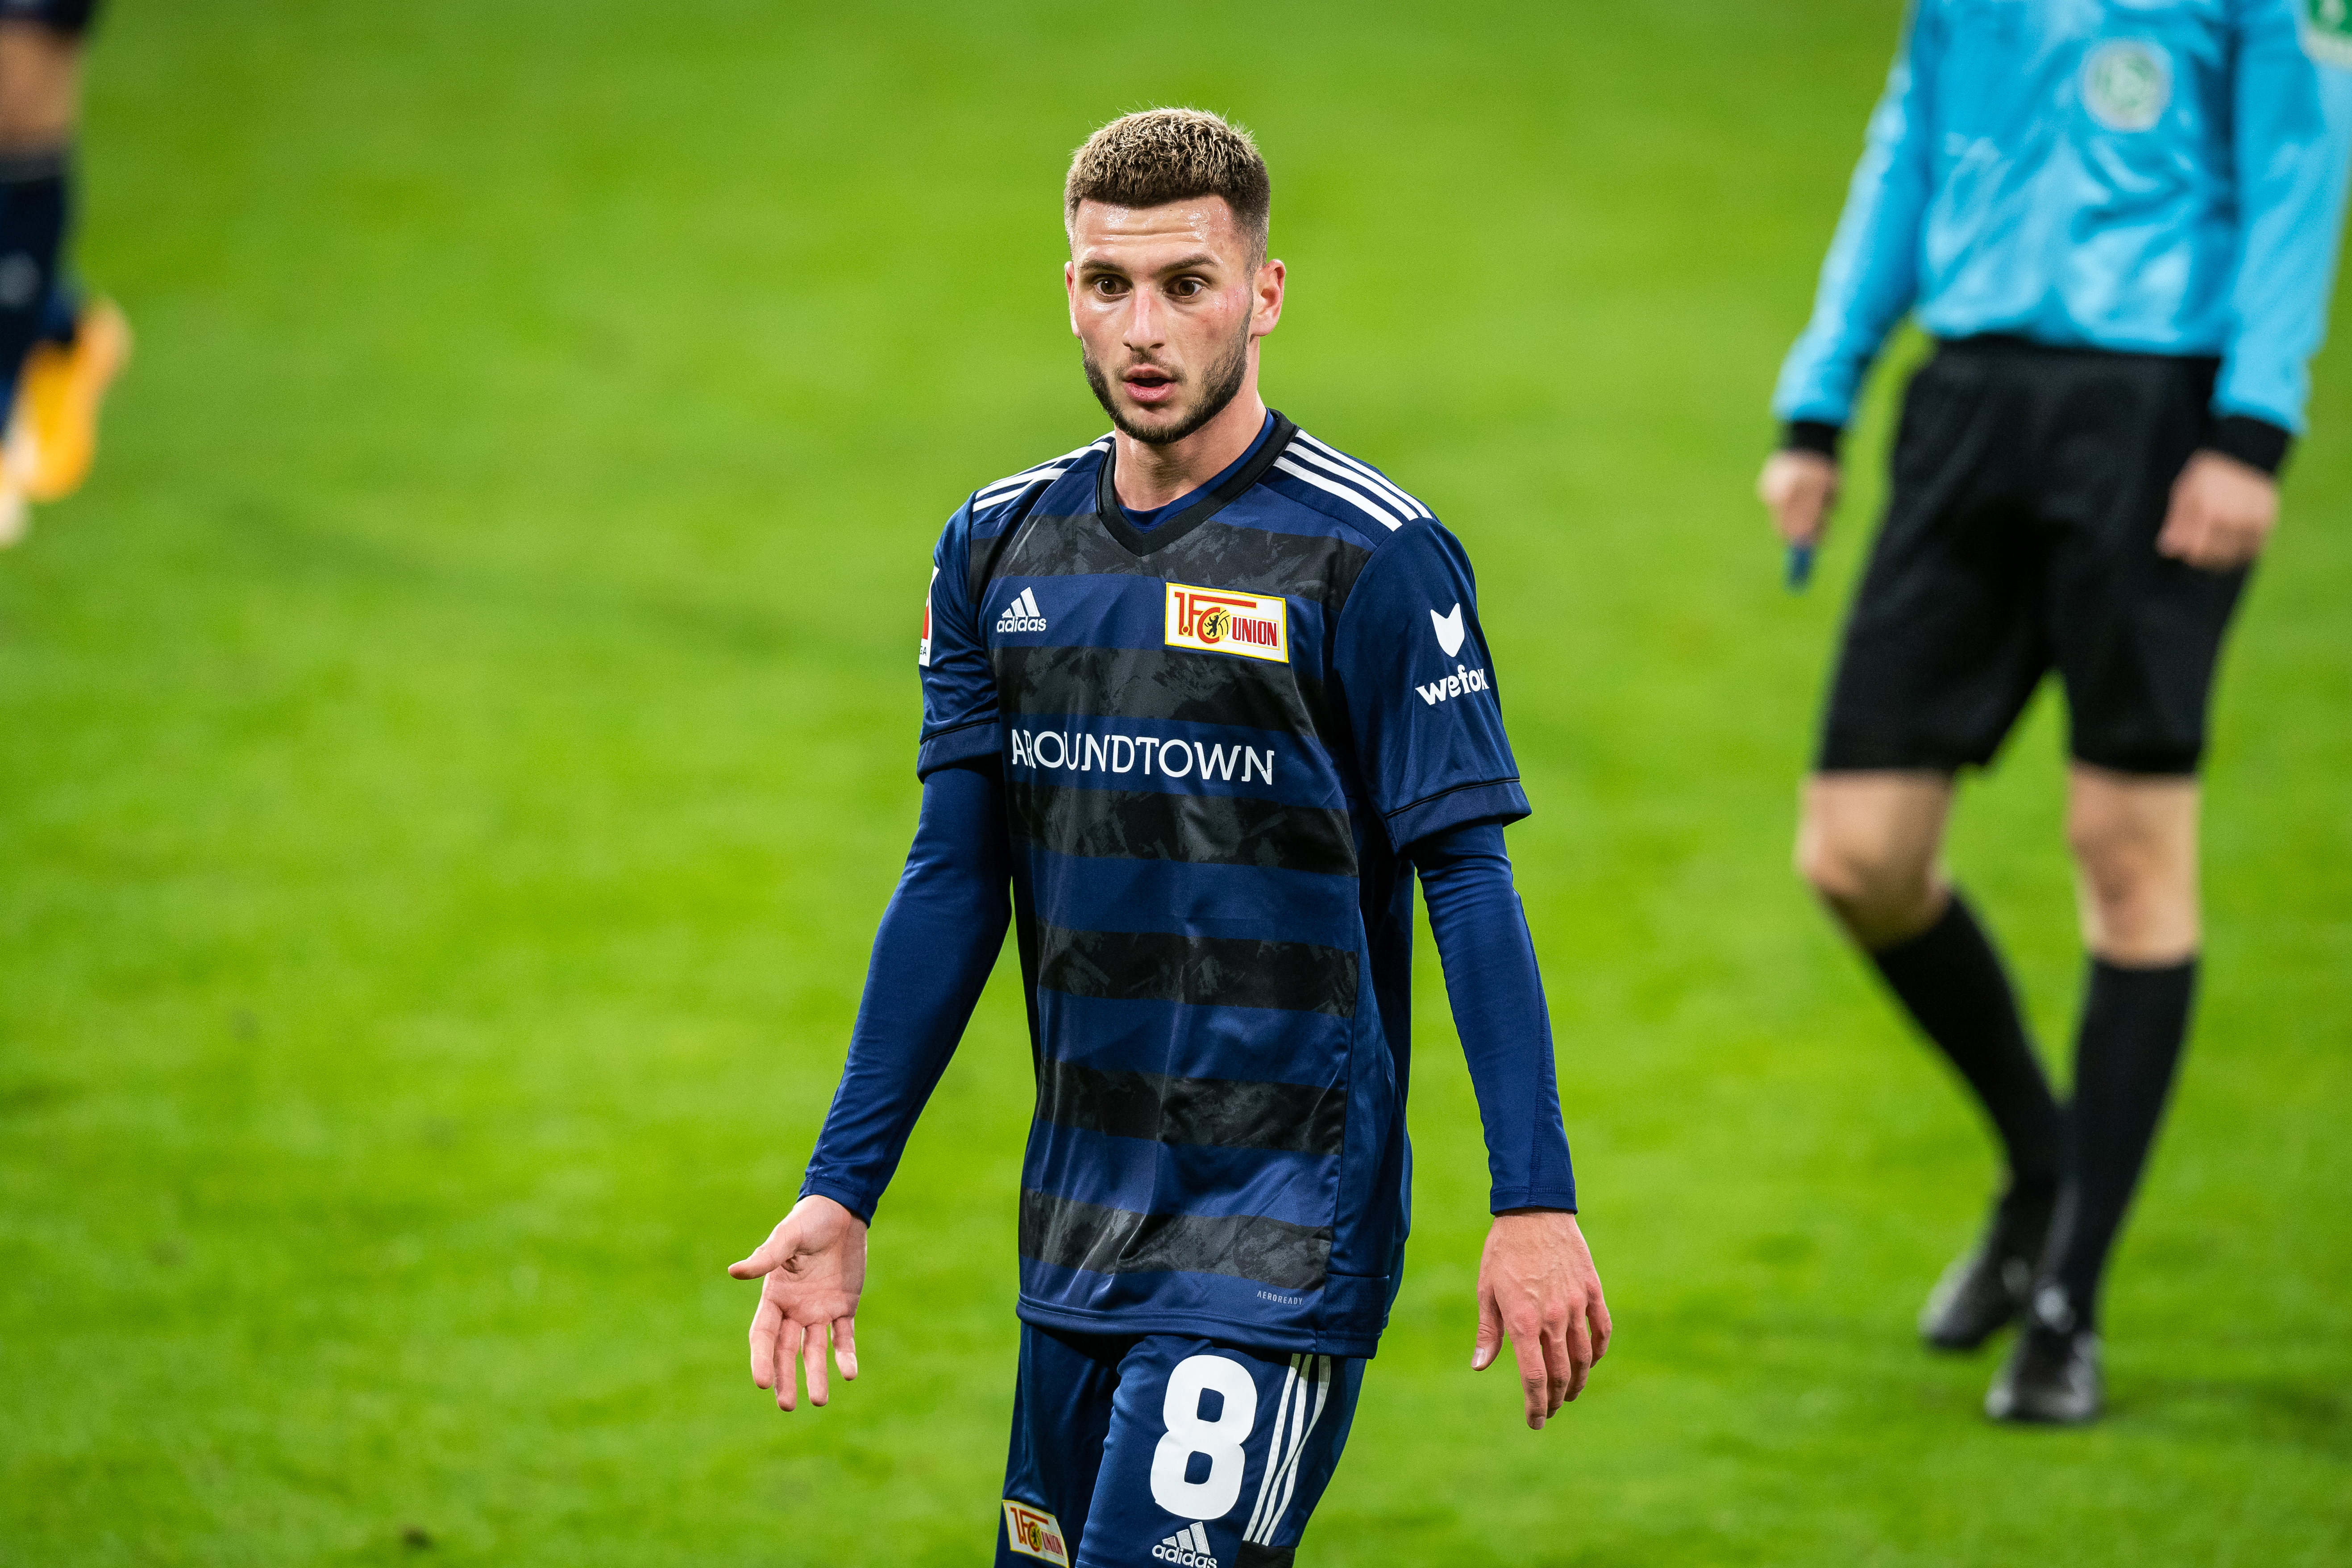 BUNDESLIGA - RB Leipzig v 1. FC Union Berlin